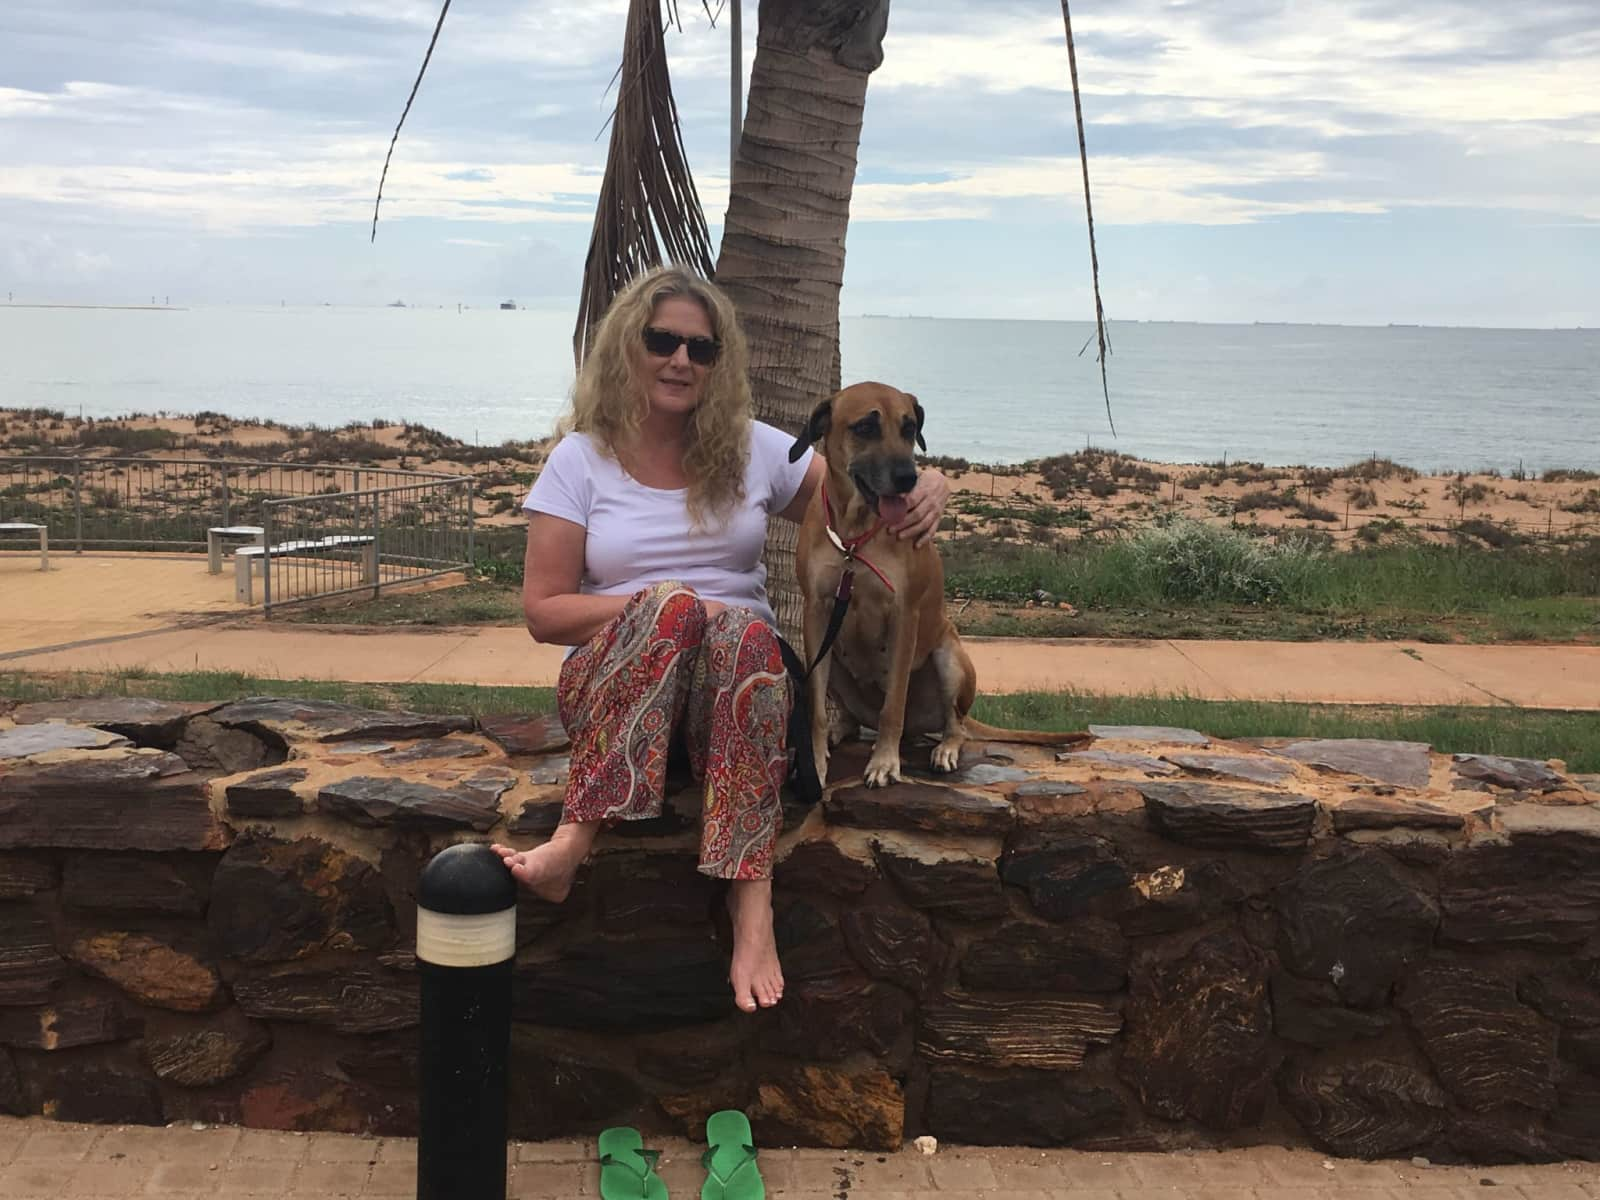 Judy from Wodonga, Victoria, Australia